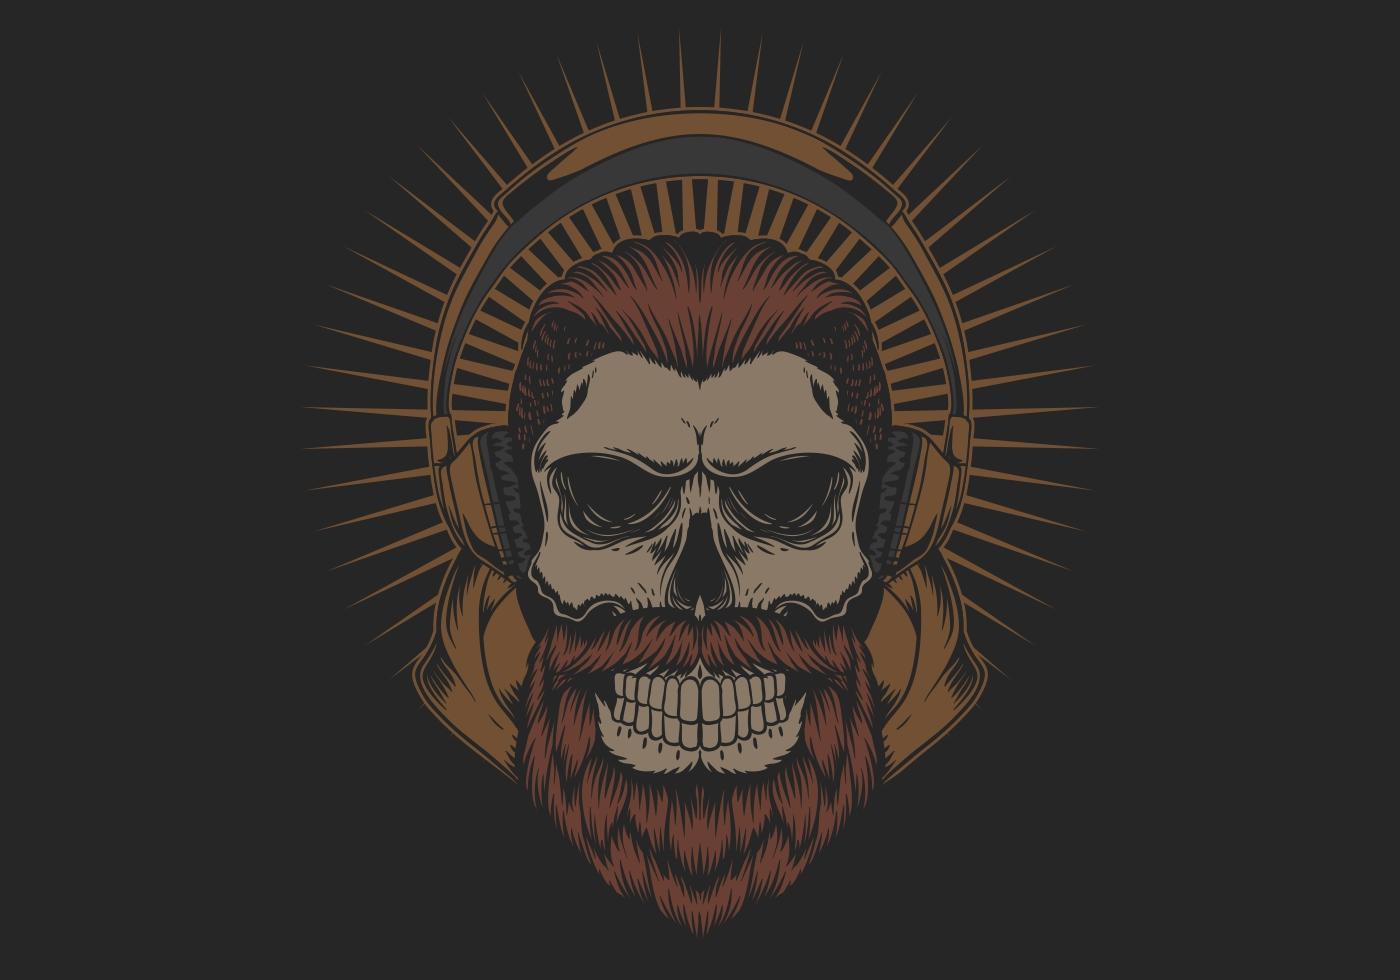 Skull head with beard and headphones